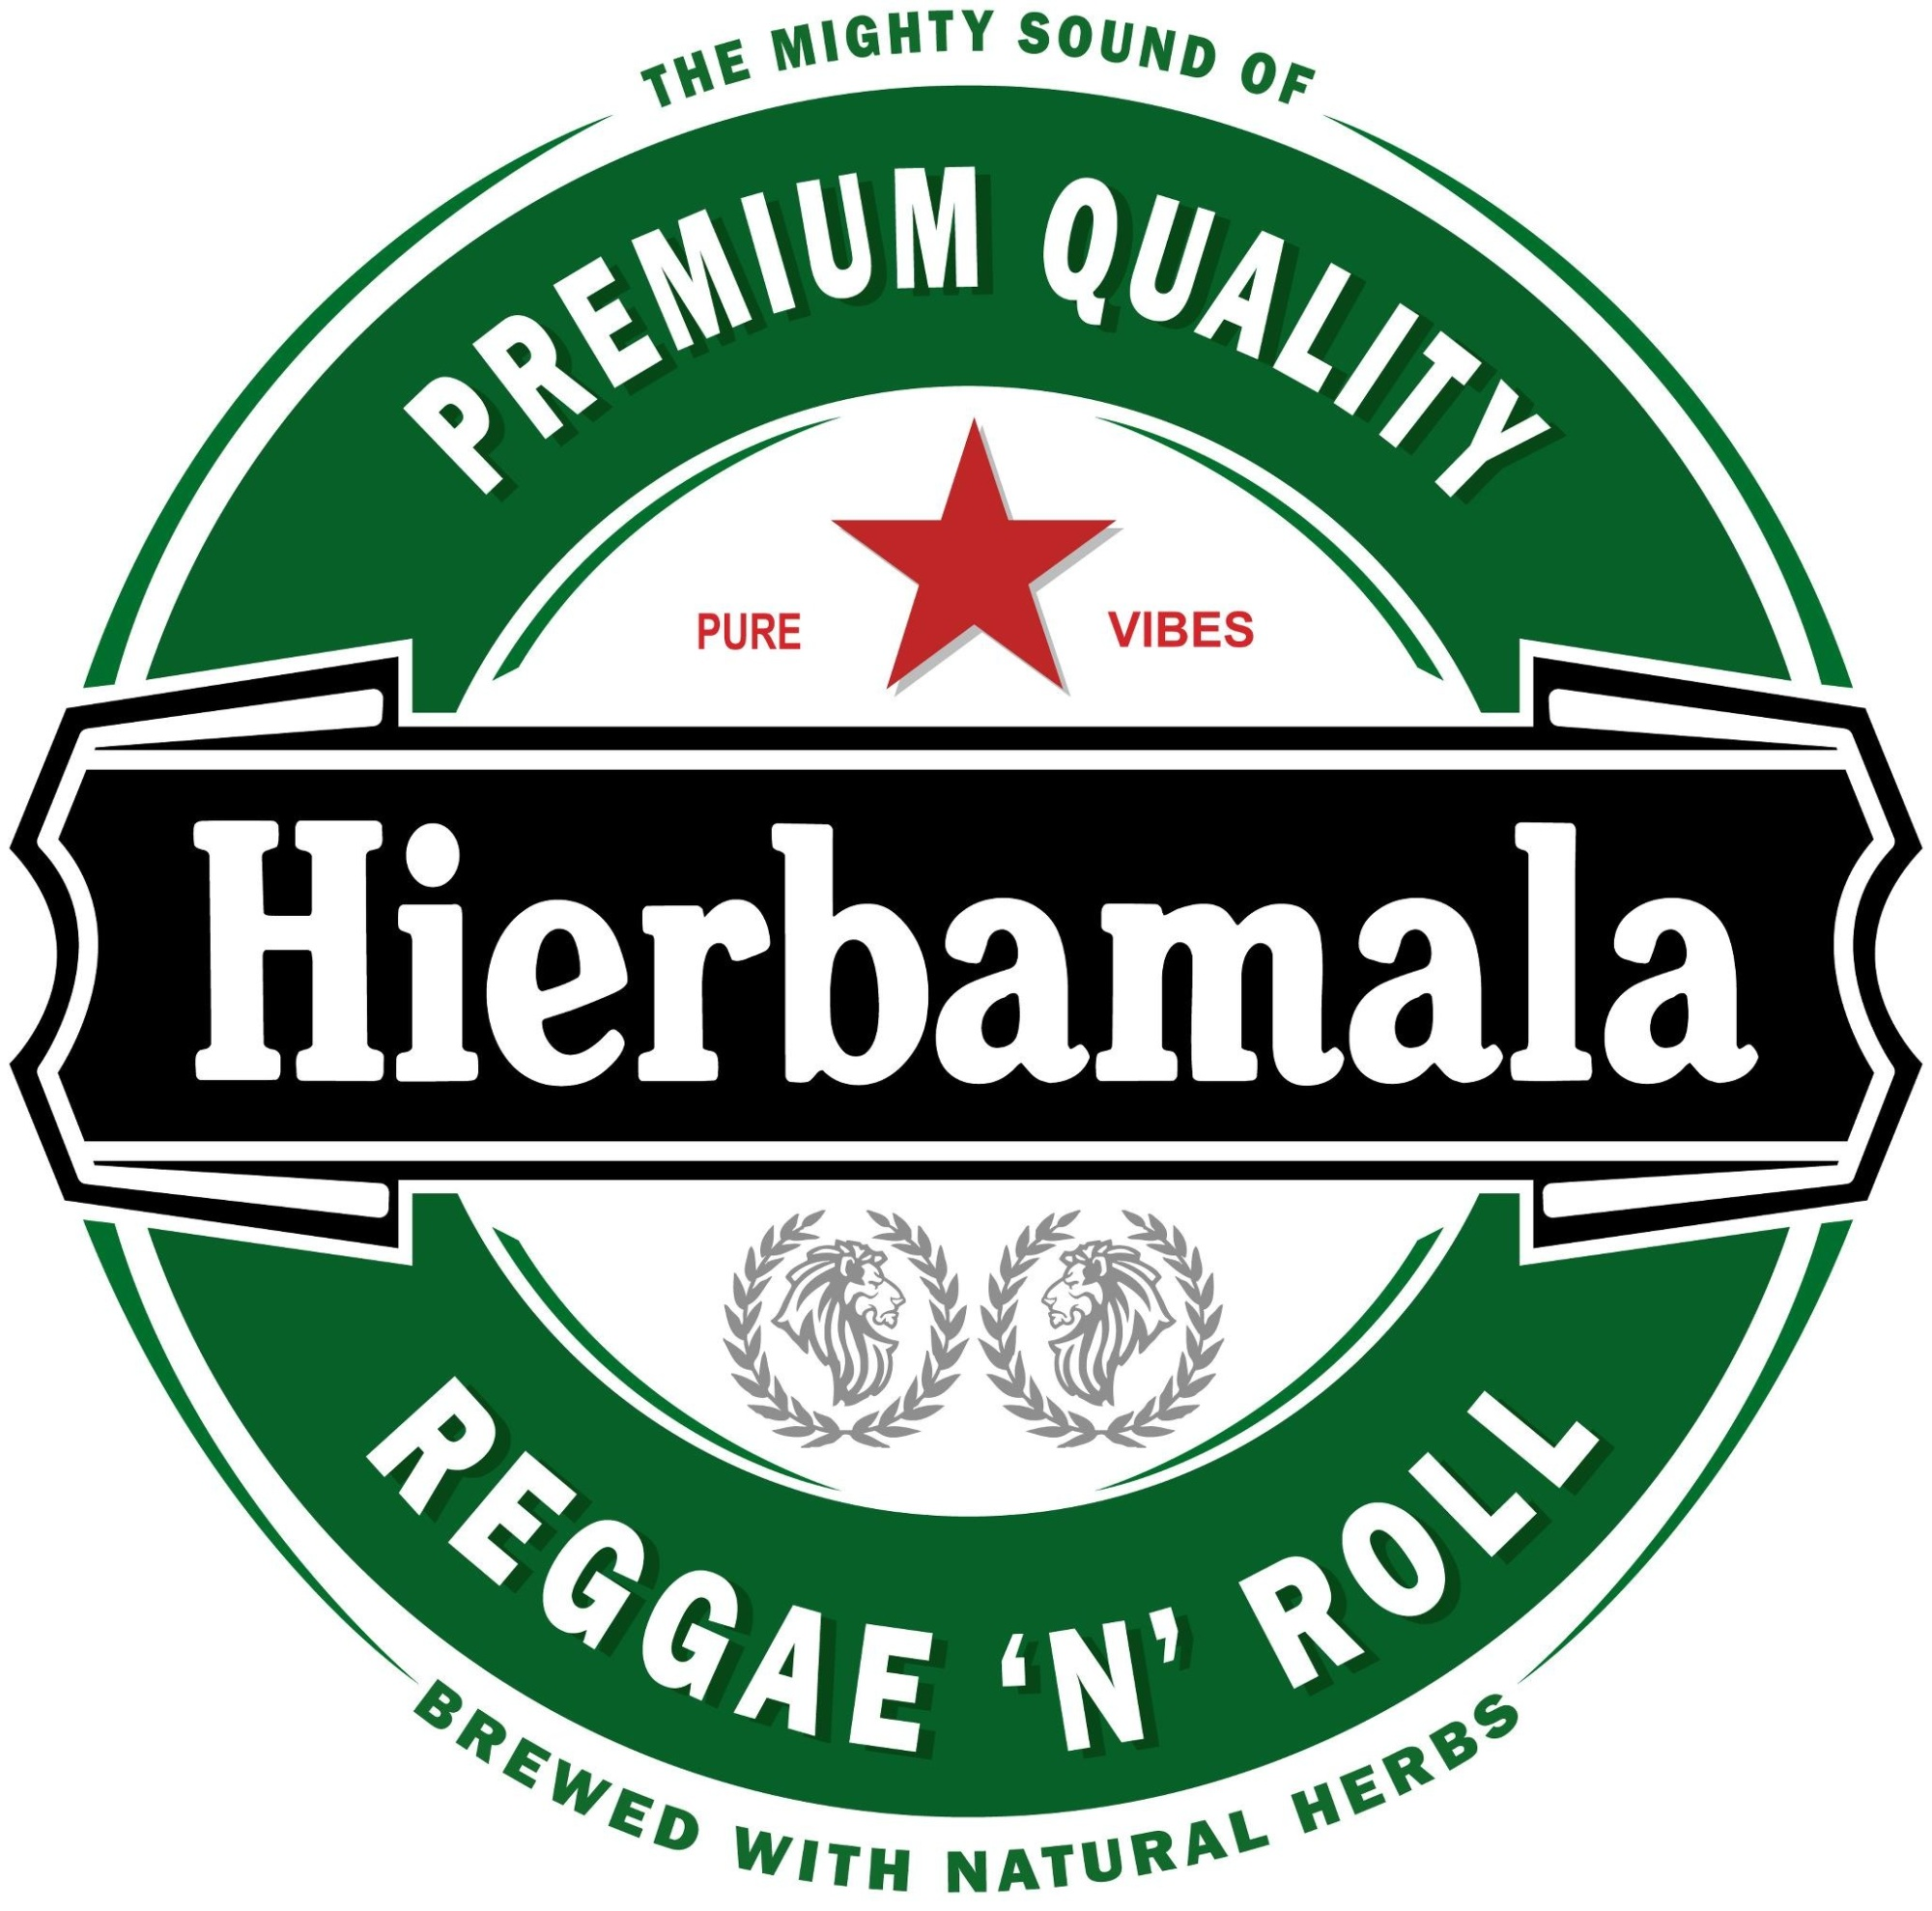 Hierba-mala-logo